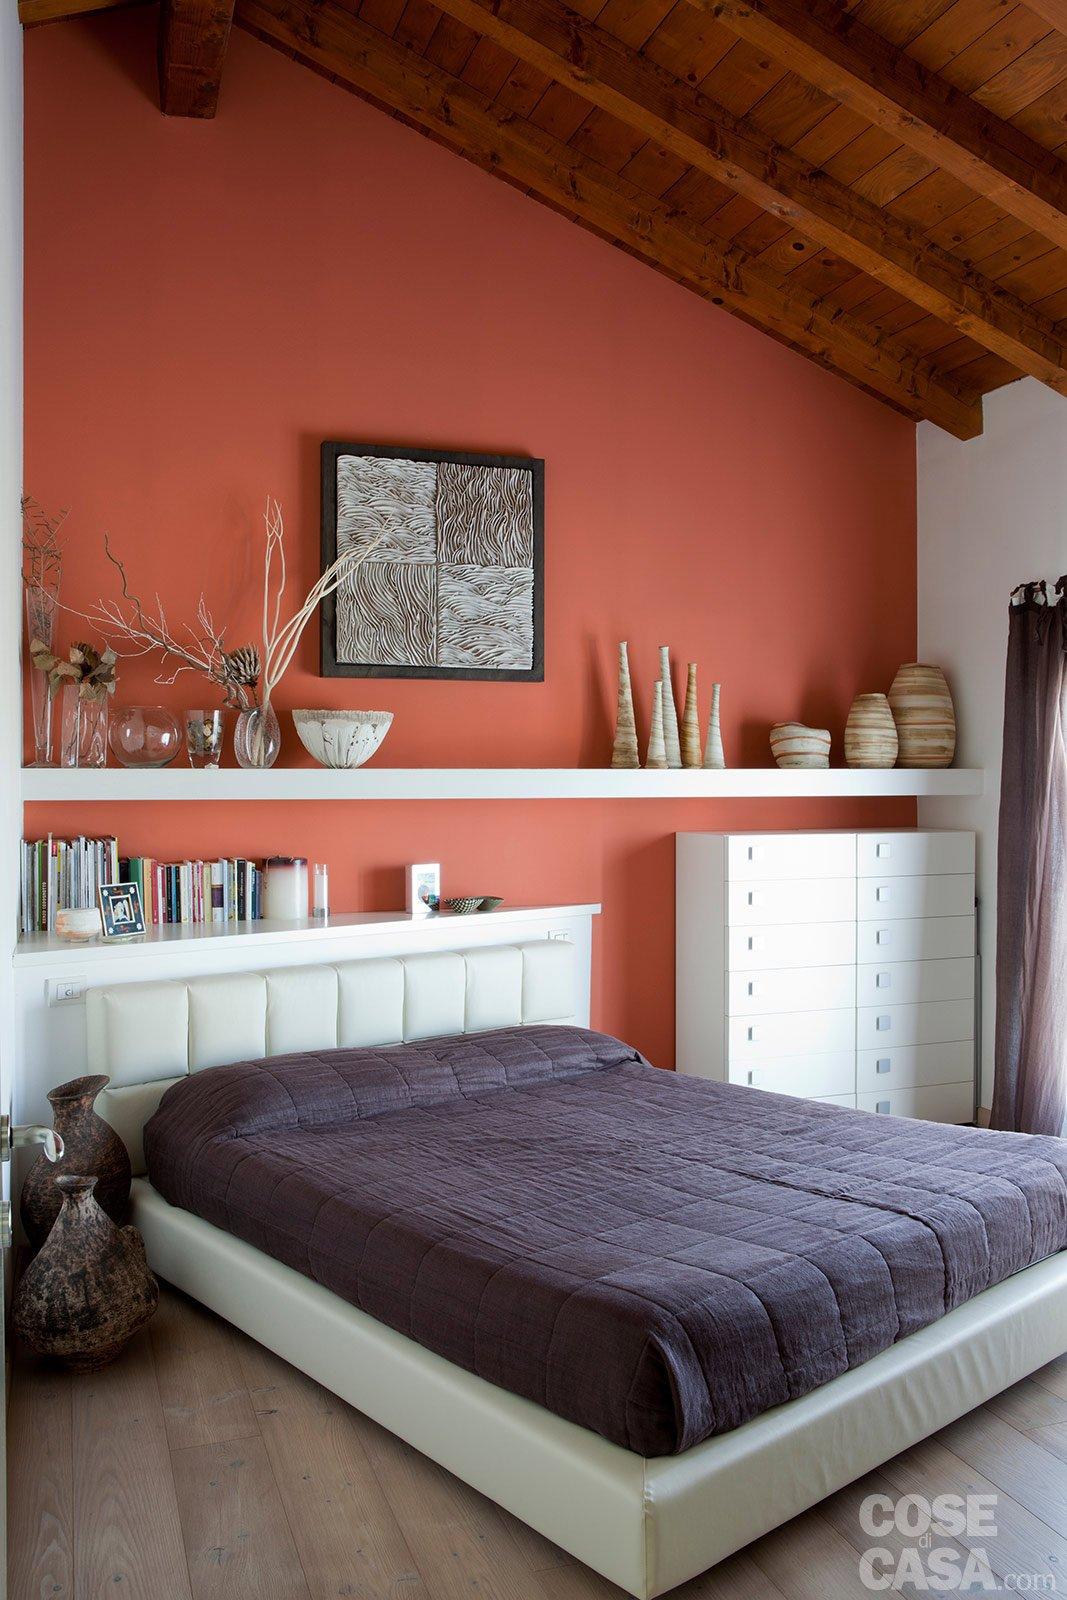 L 39 ex cascina diventa casa cose di casa for Artigiani piani casa fresca